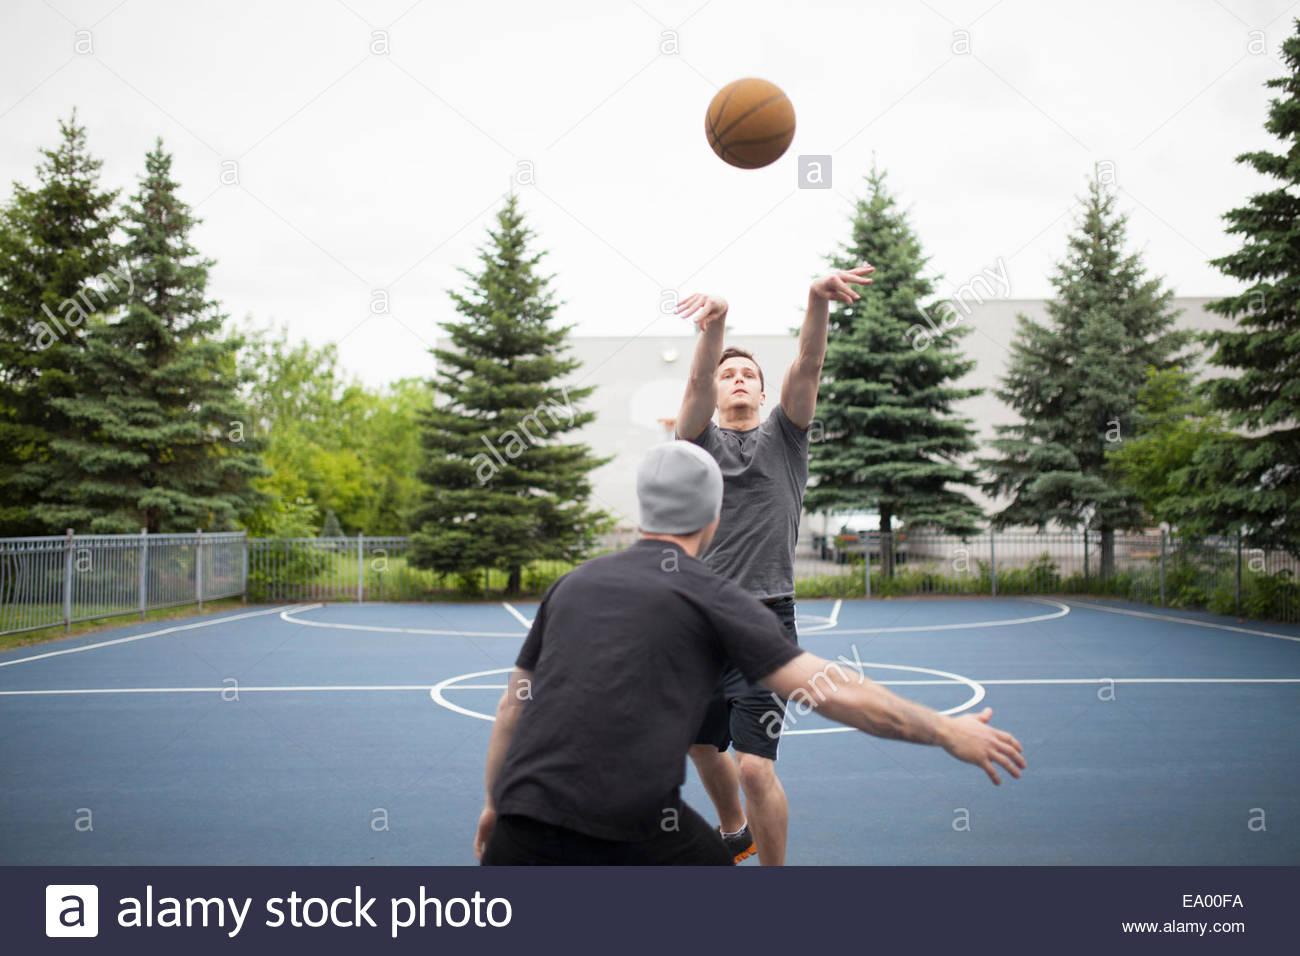 Young men playing basketball - Stock Image